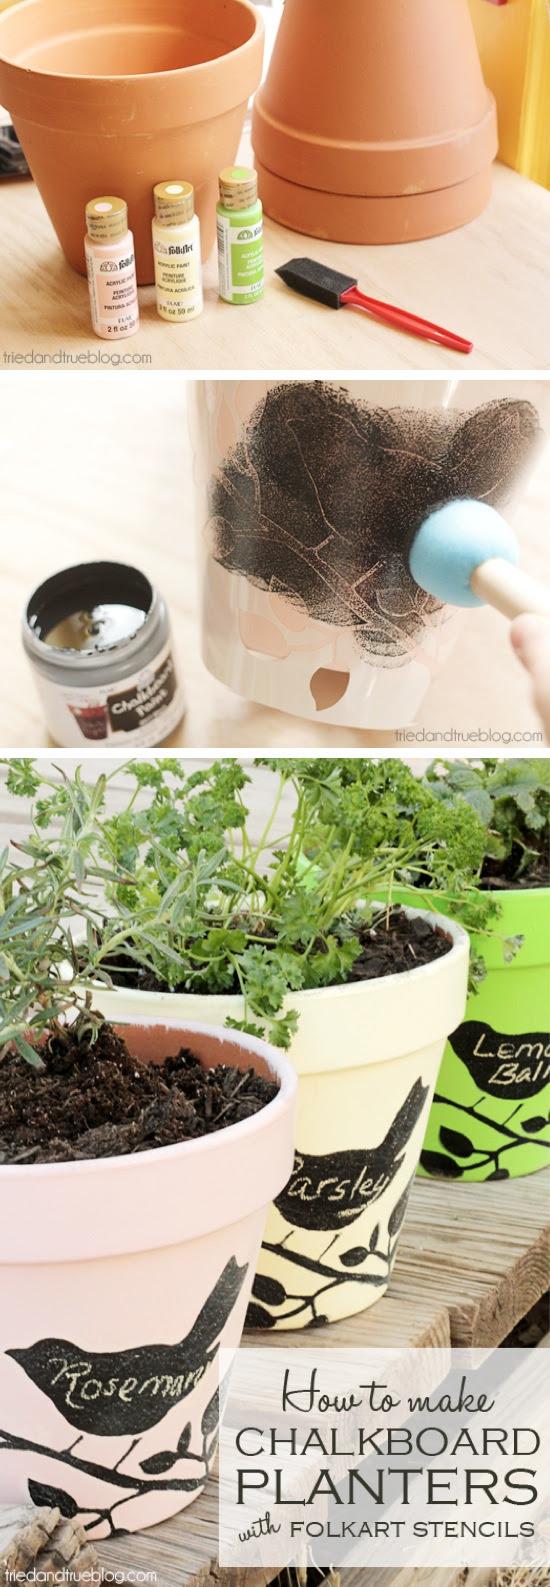 DIY Chalkboard Stencil Planters - Craft By Photo